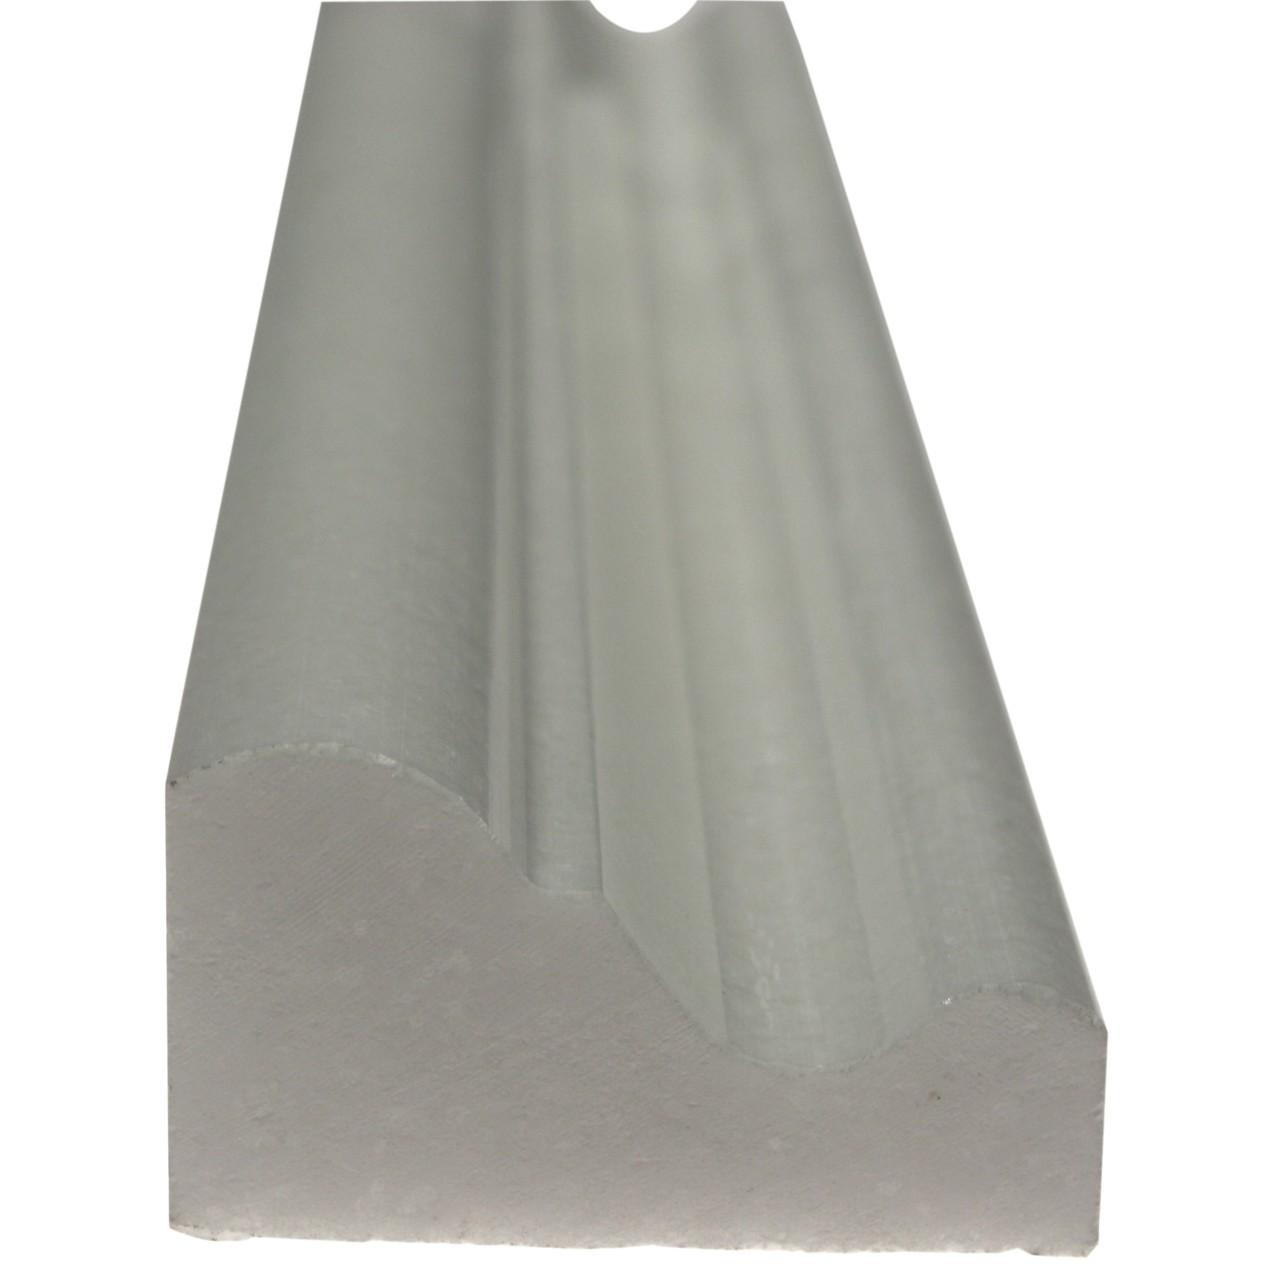 White thassos marble 2x12 chair rail molding Honed |Thassos Marble 2x12